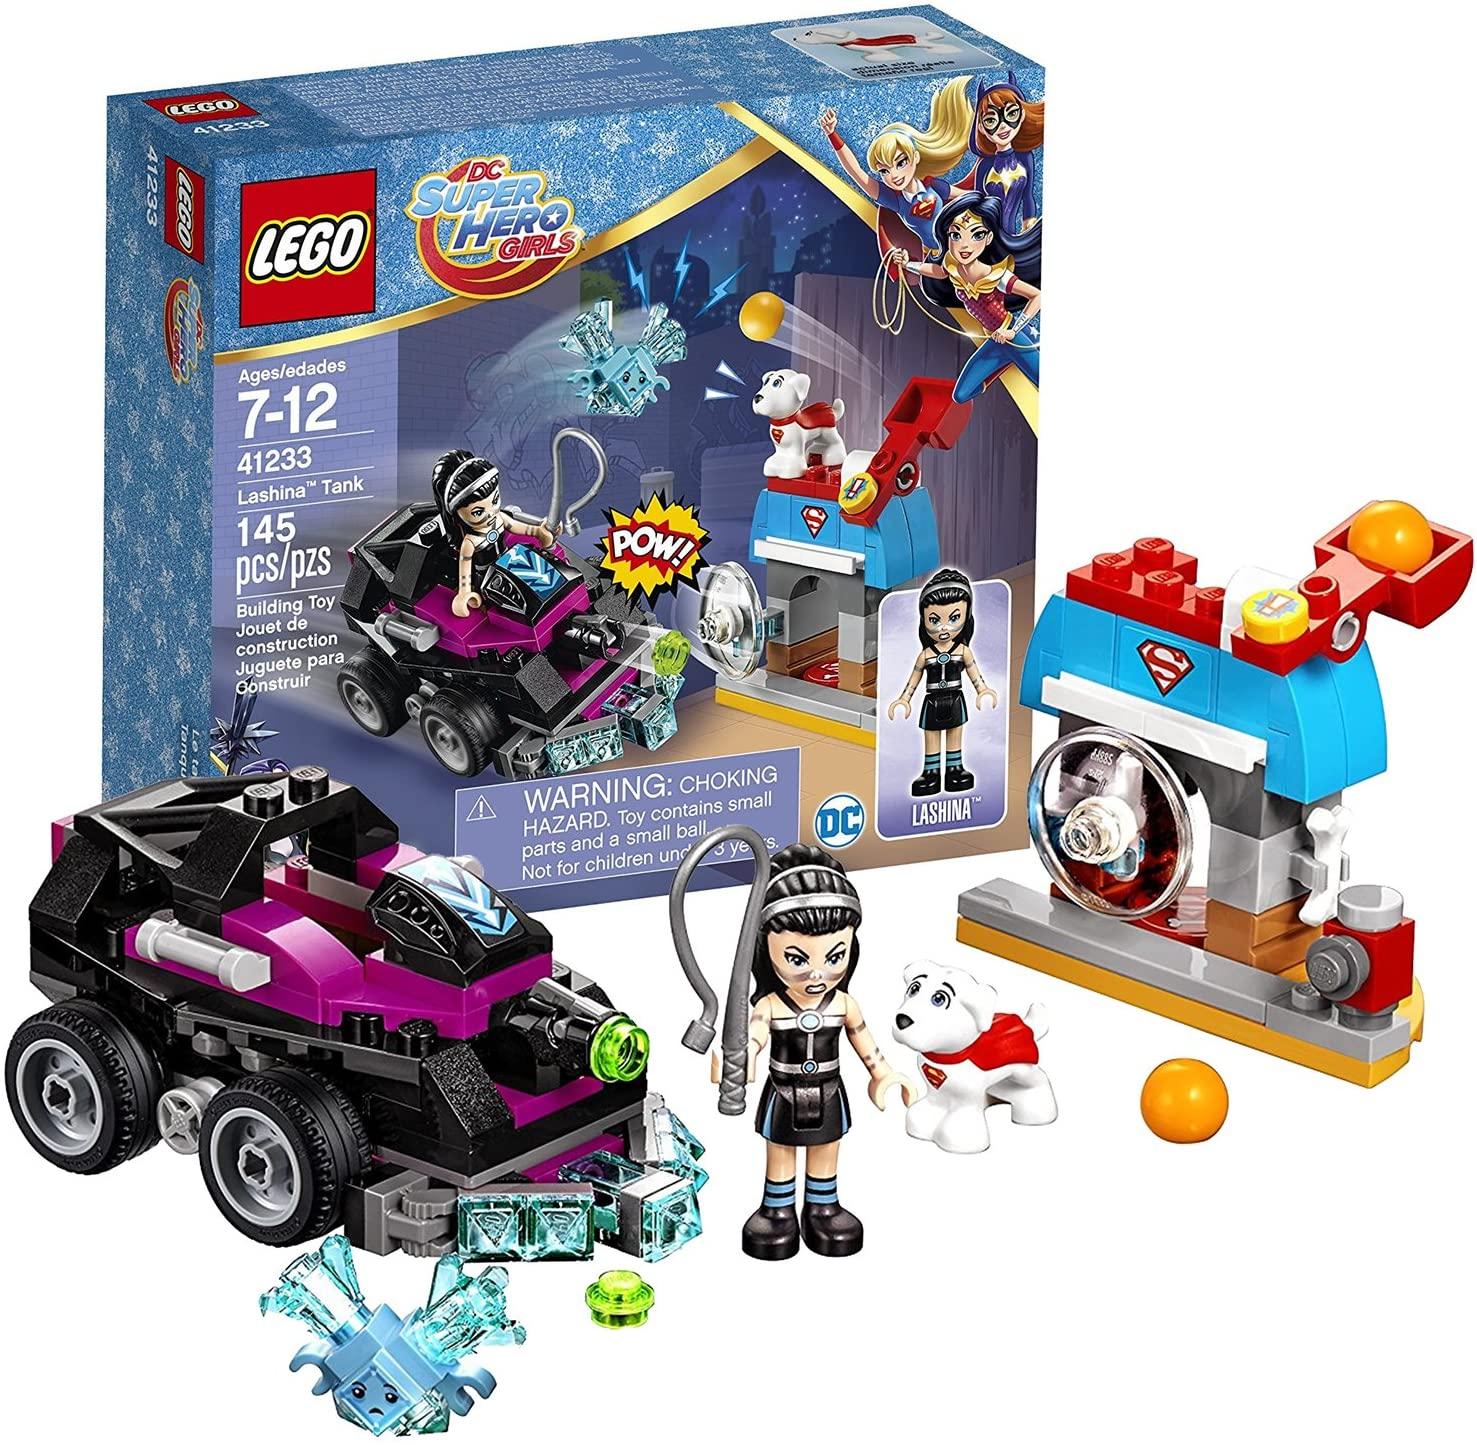 Lego Year 2017 DC Super Hero Girls Series Set #41233 - LASHINA TANK with Cage, Confused Kryptomite Plus Krypto and Lashina Minifigure (Pieces: 145)